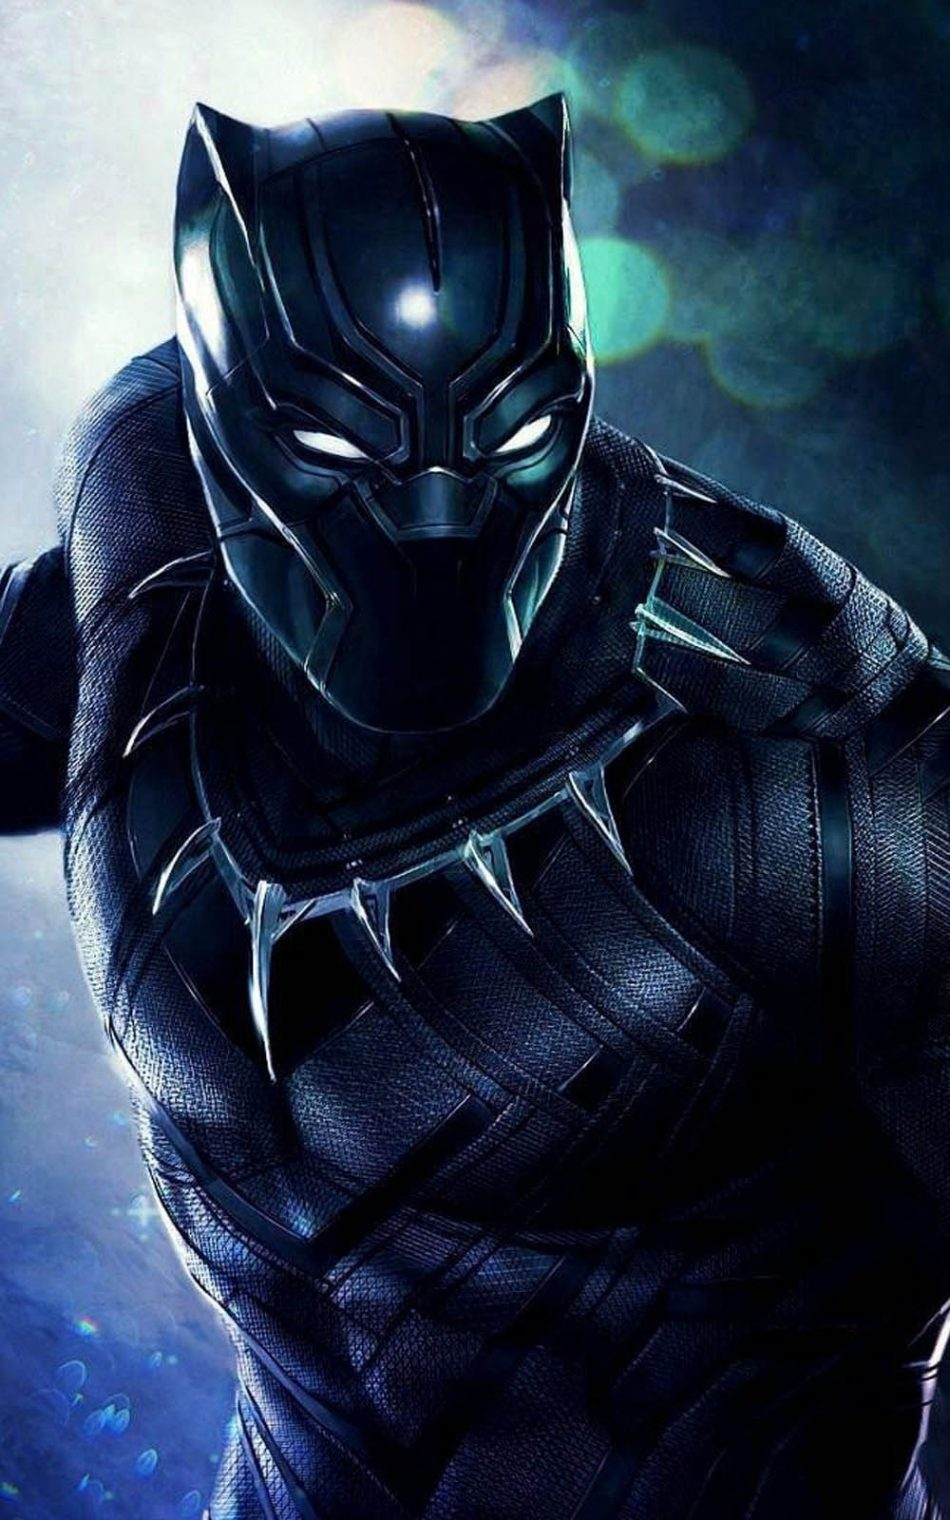 Black Panther Artwork 4K Ultra HD Mobile Wallpaper